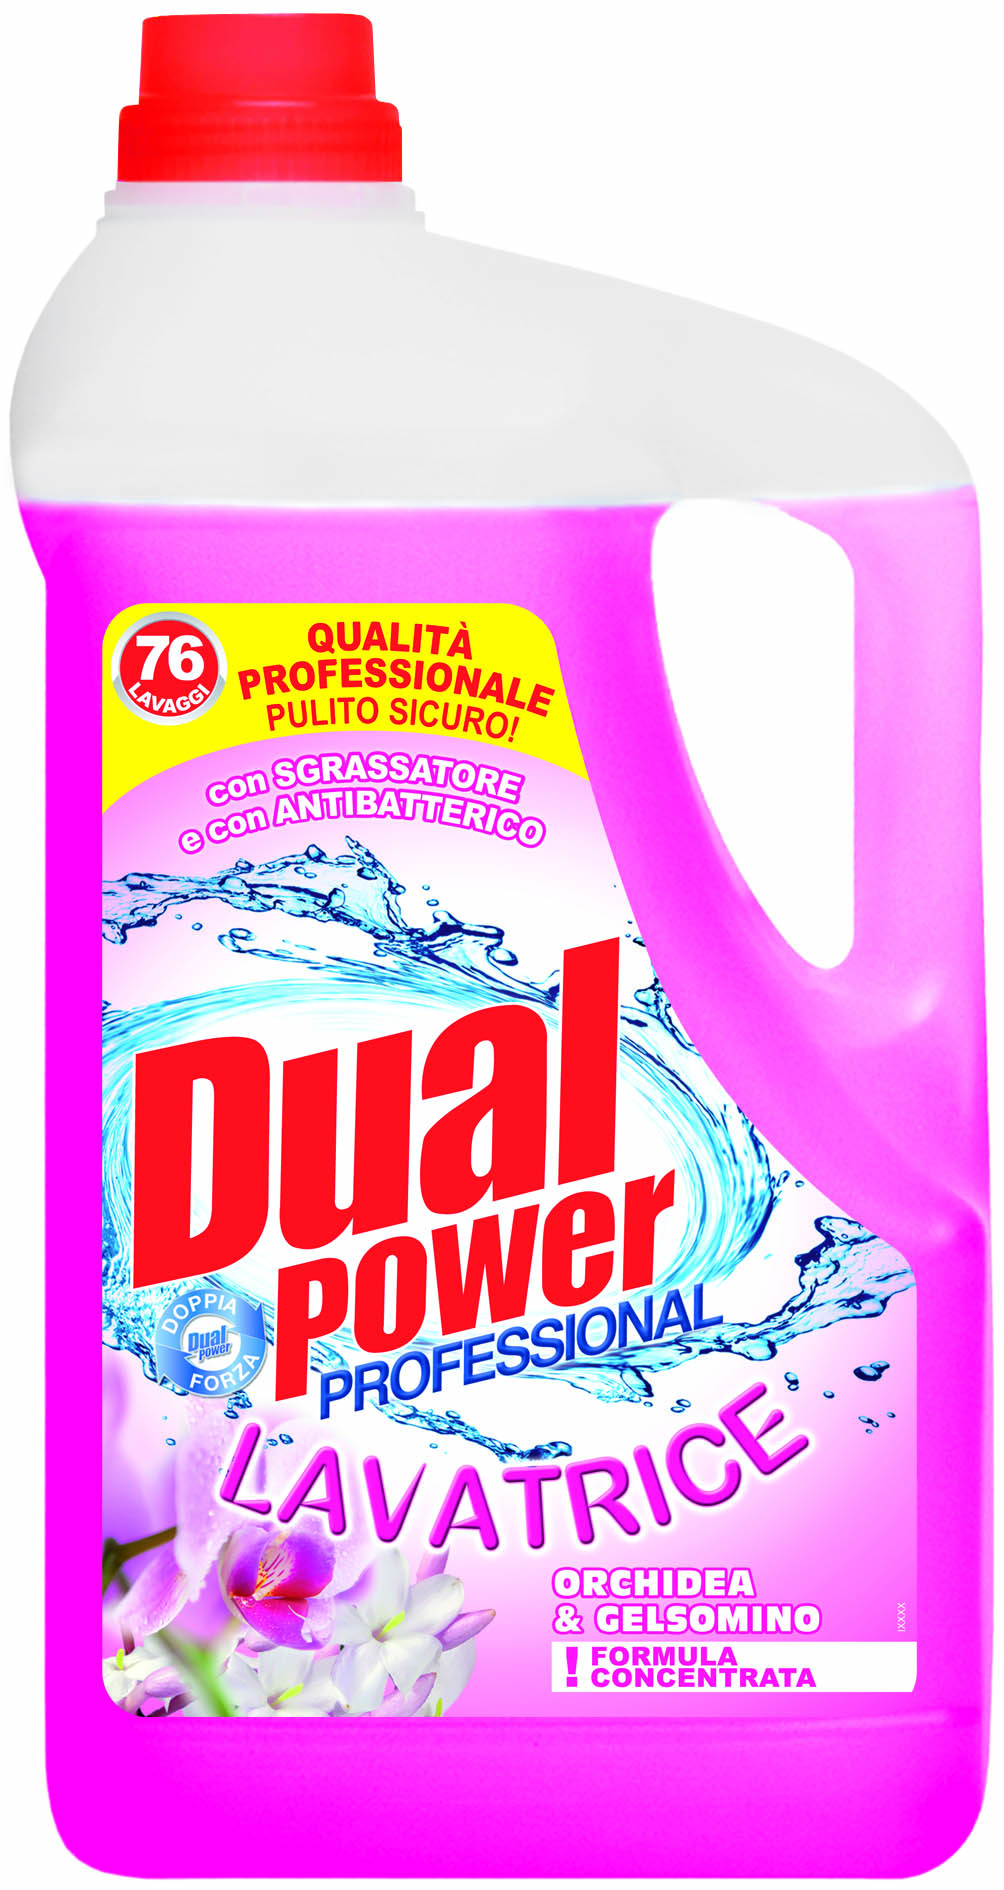 Dual power lavatrice orchidea e gelsomino dual power for Quale lavatrice comprare